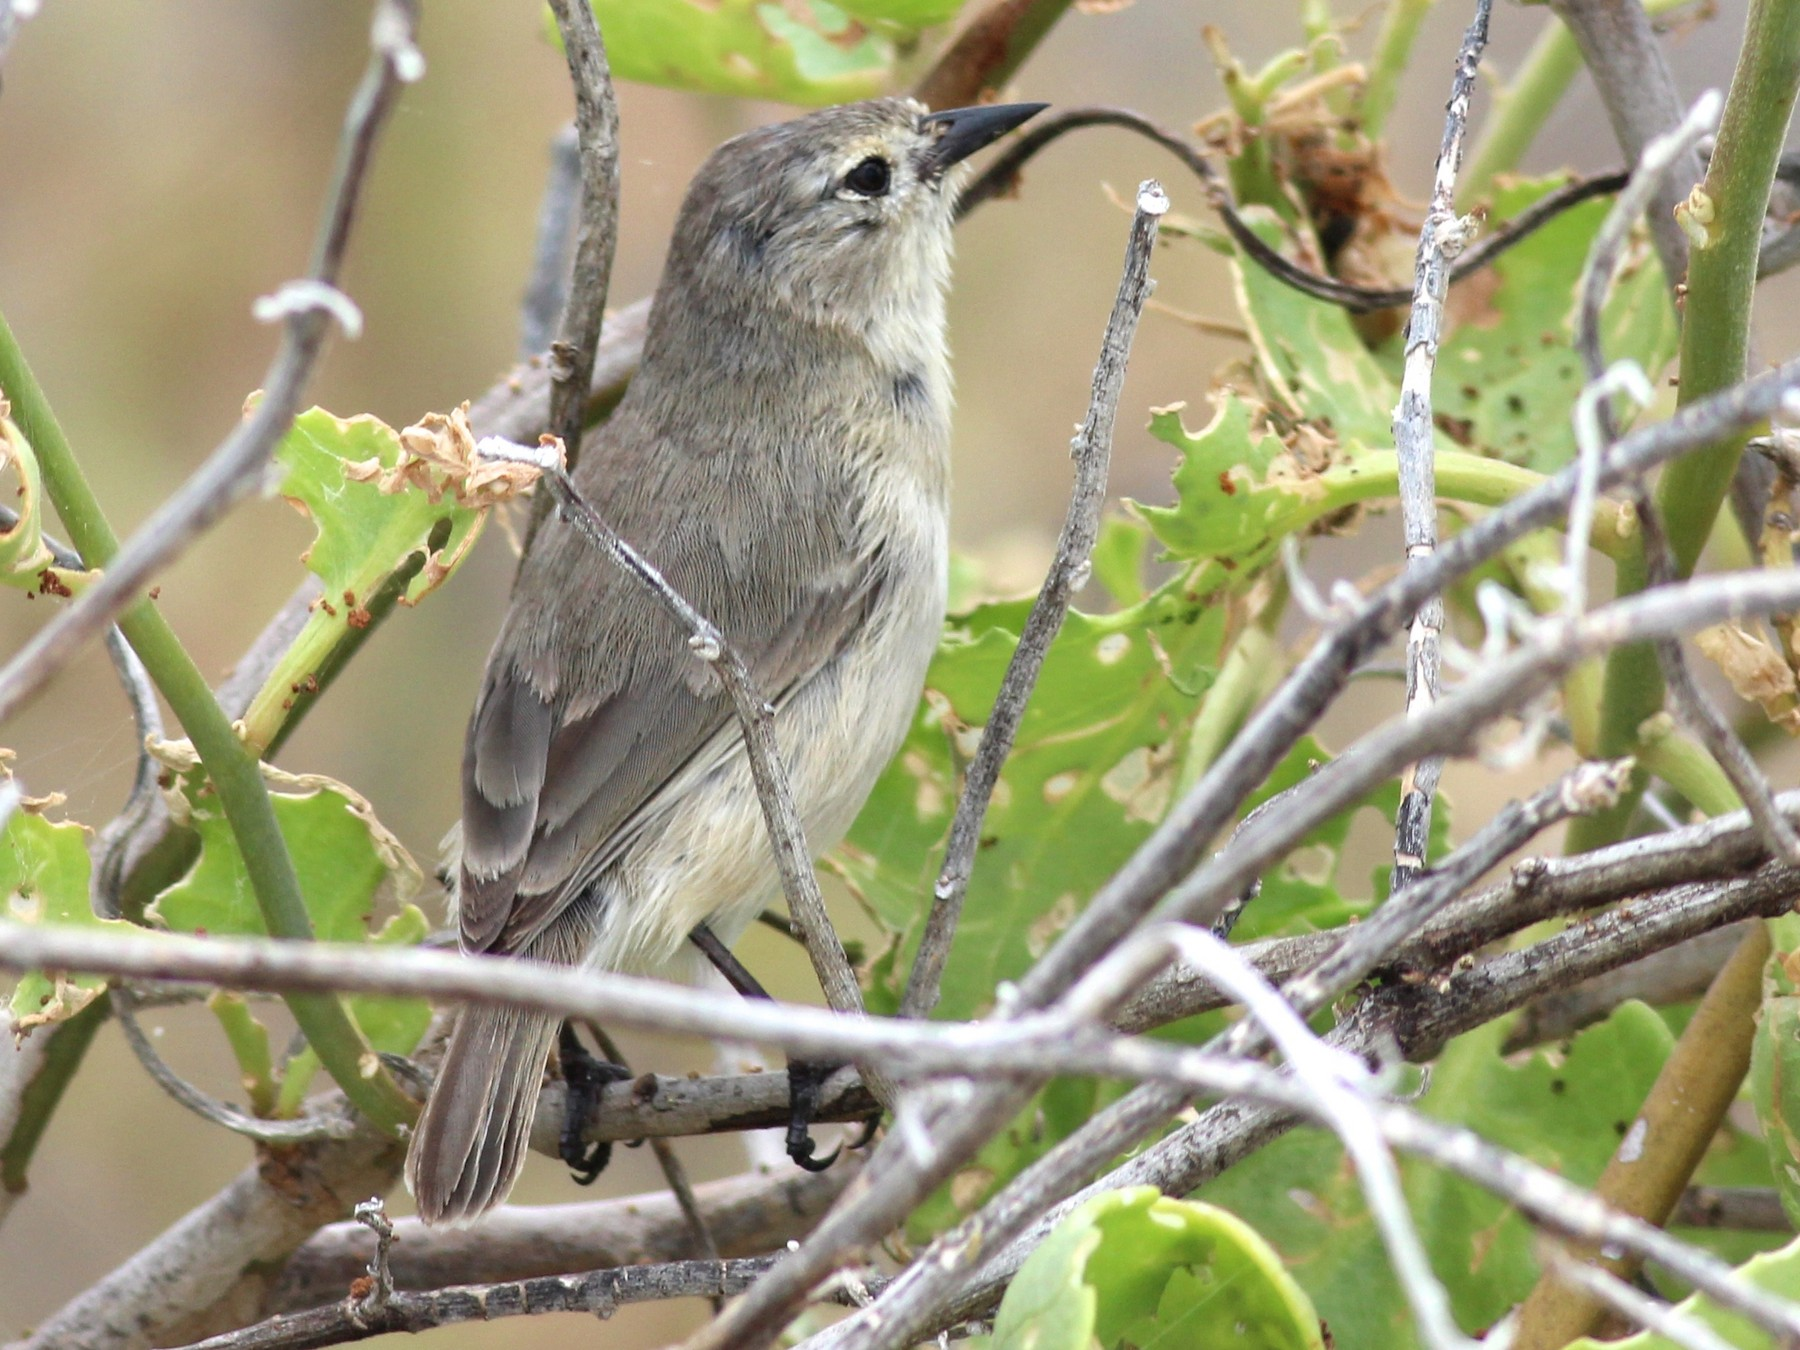 Gray Warbler-Finch - Shawn Billerman